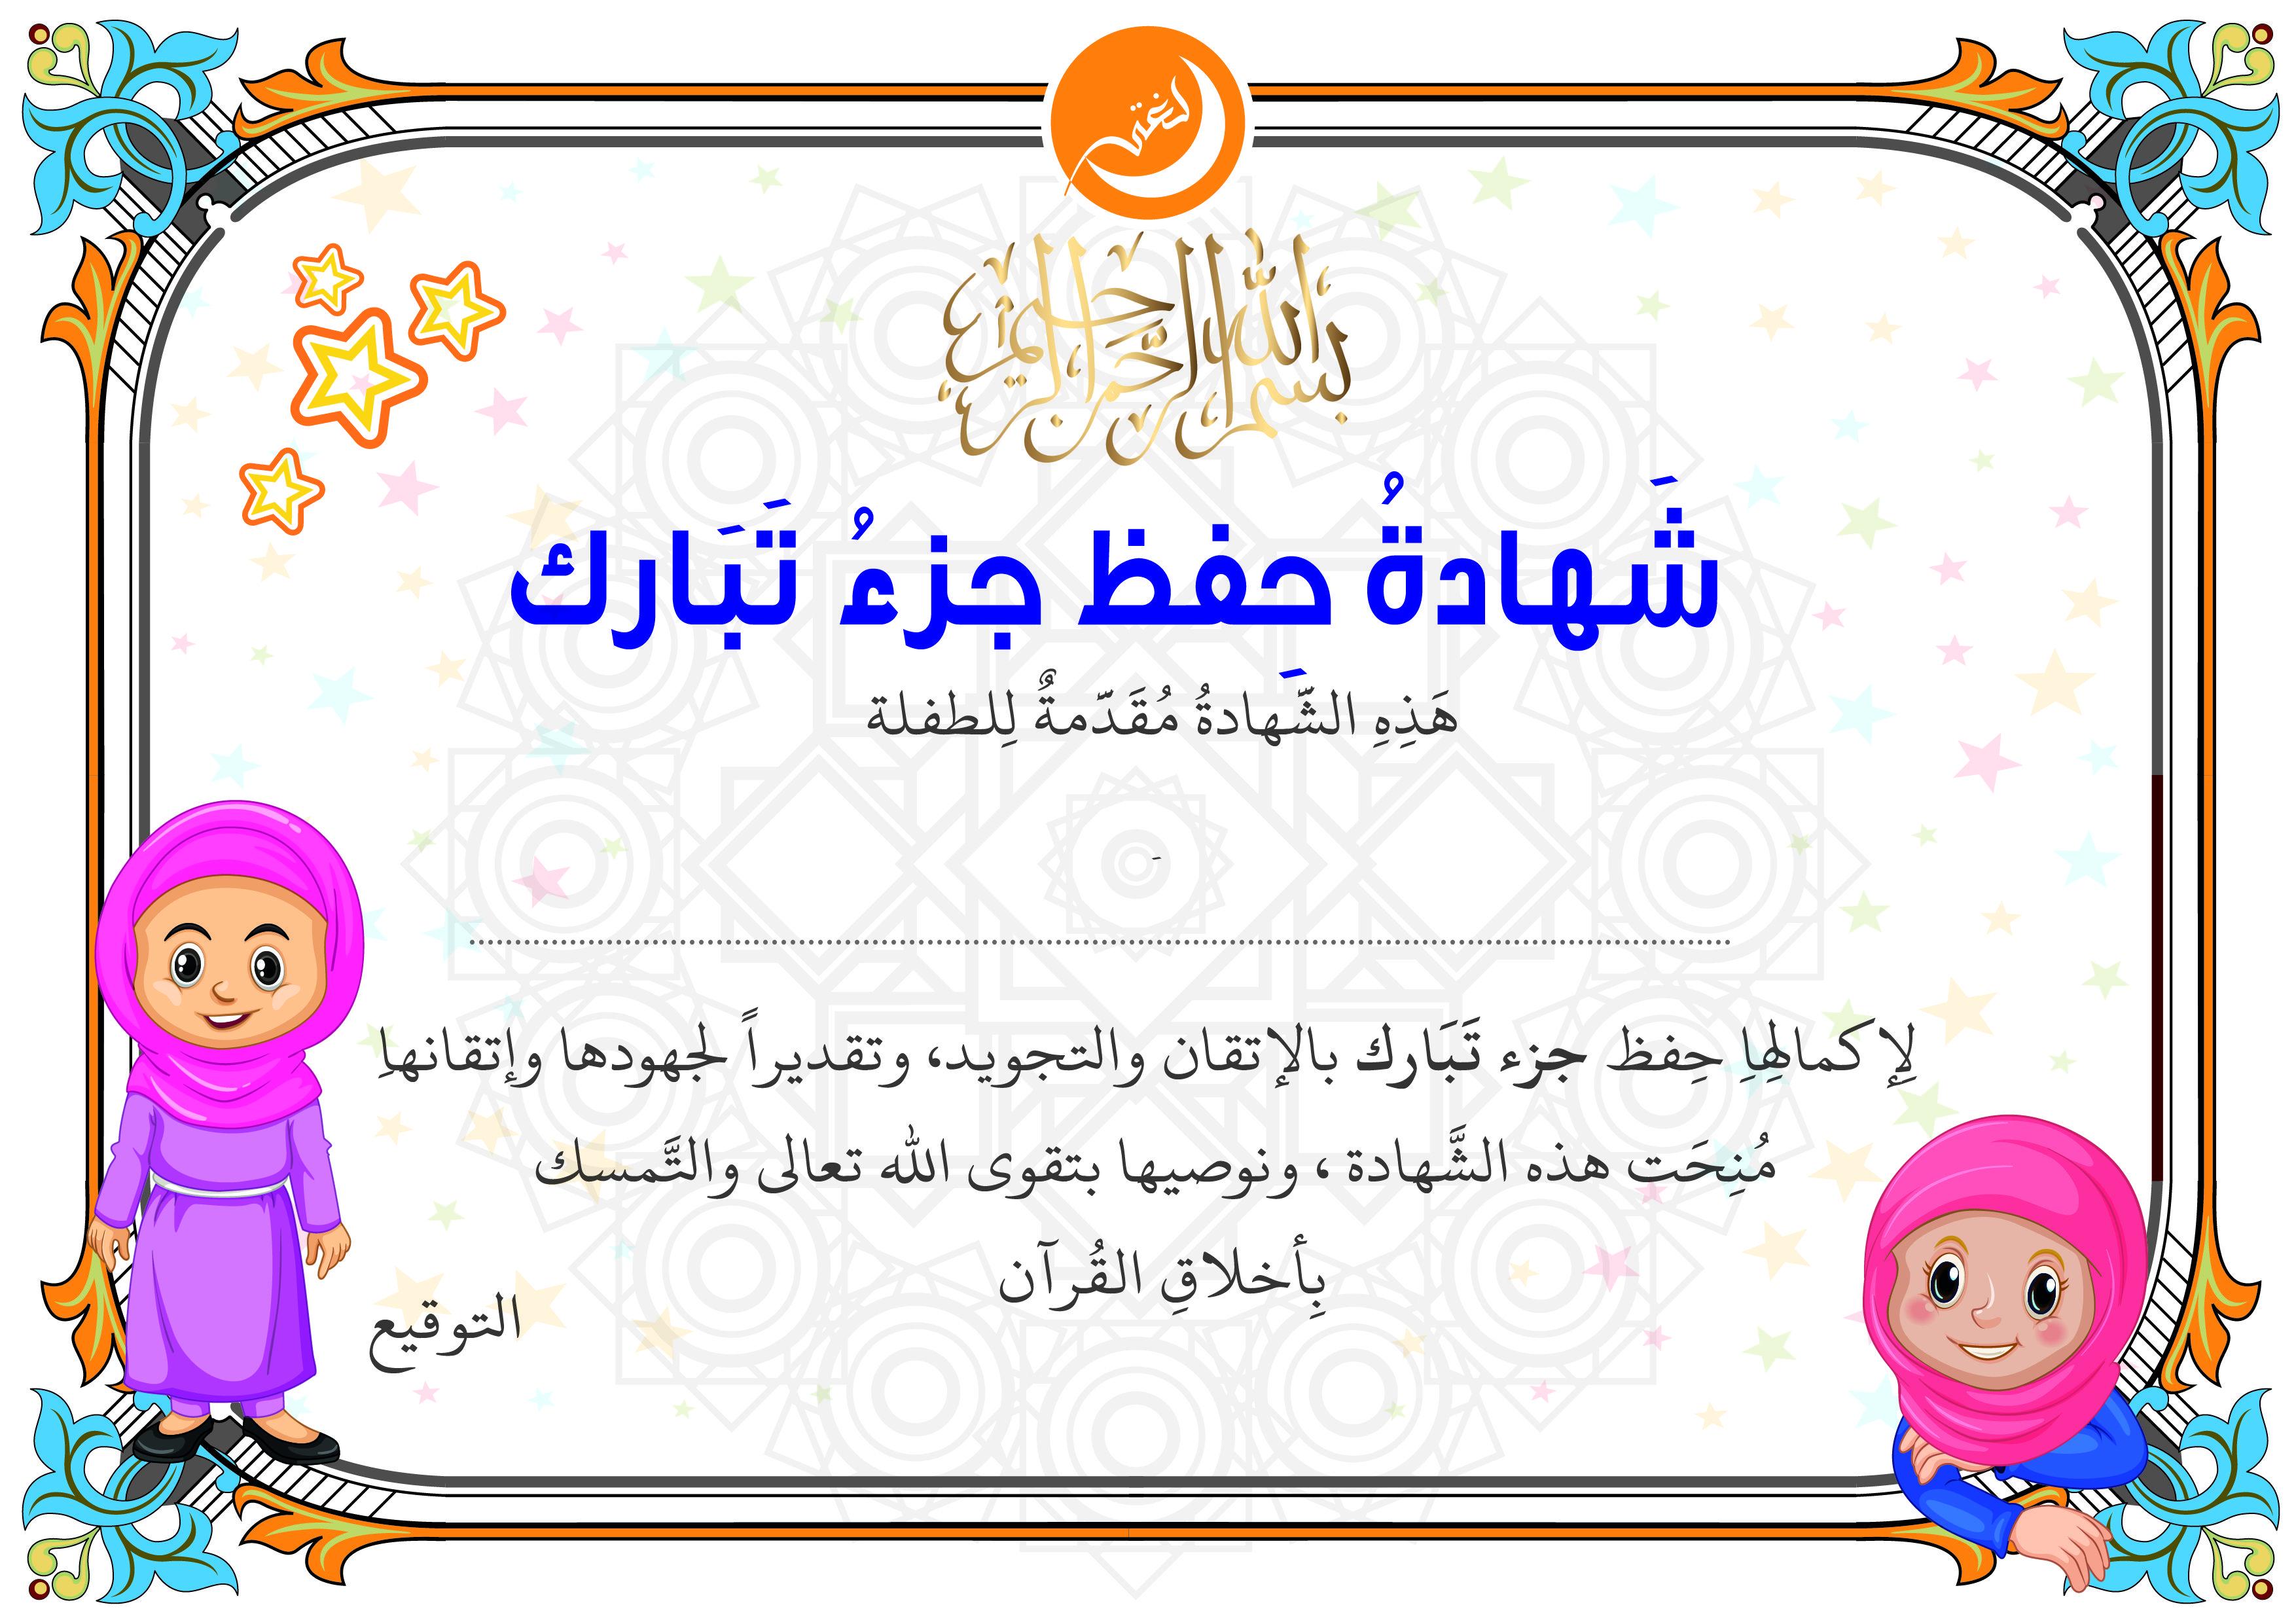 Certificate Of Memorizing Juz Tabarak For Girls Free Downloadable From Lugati Islamic Books For Kids Muslim Kids Activities Islamic Kids Activities